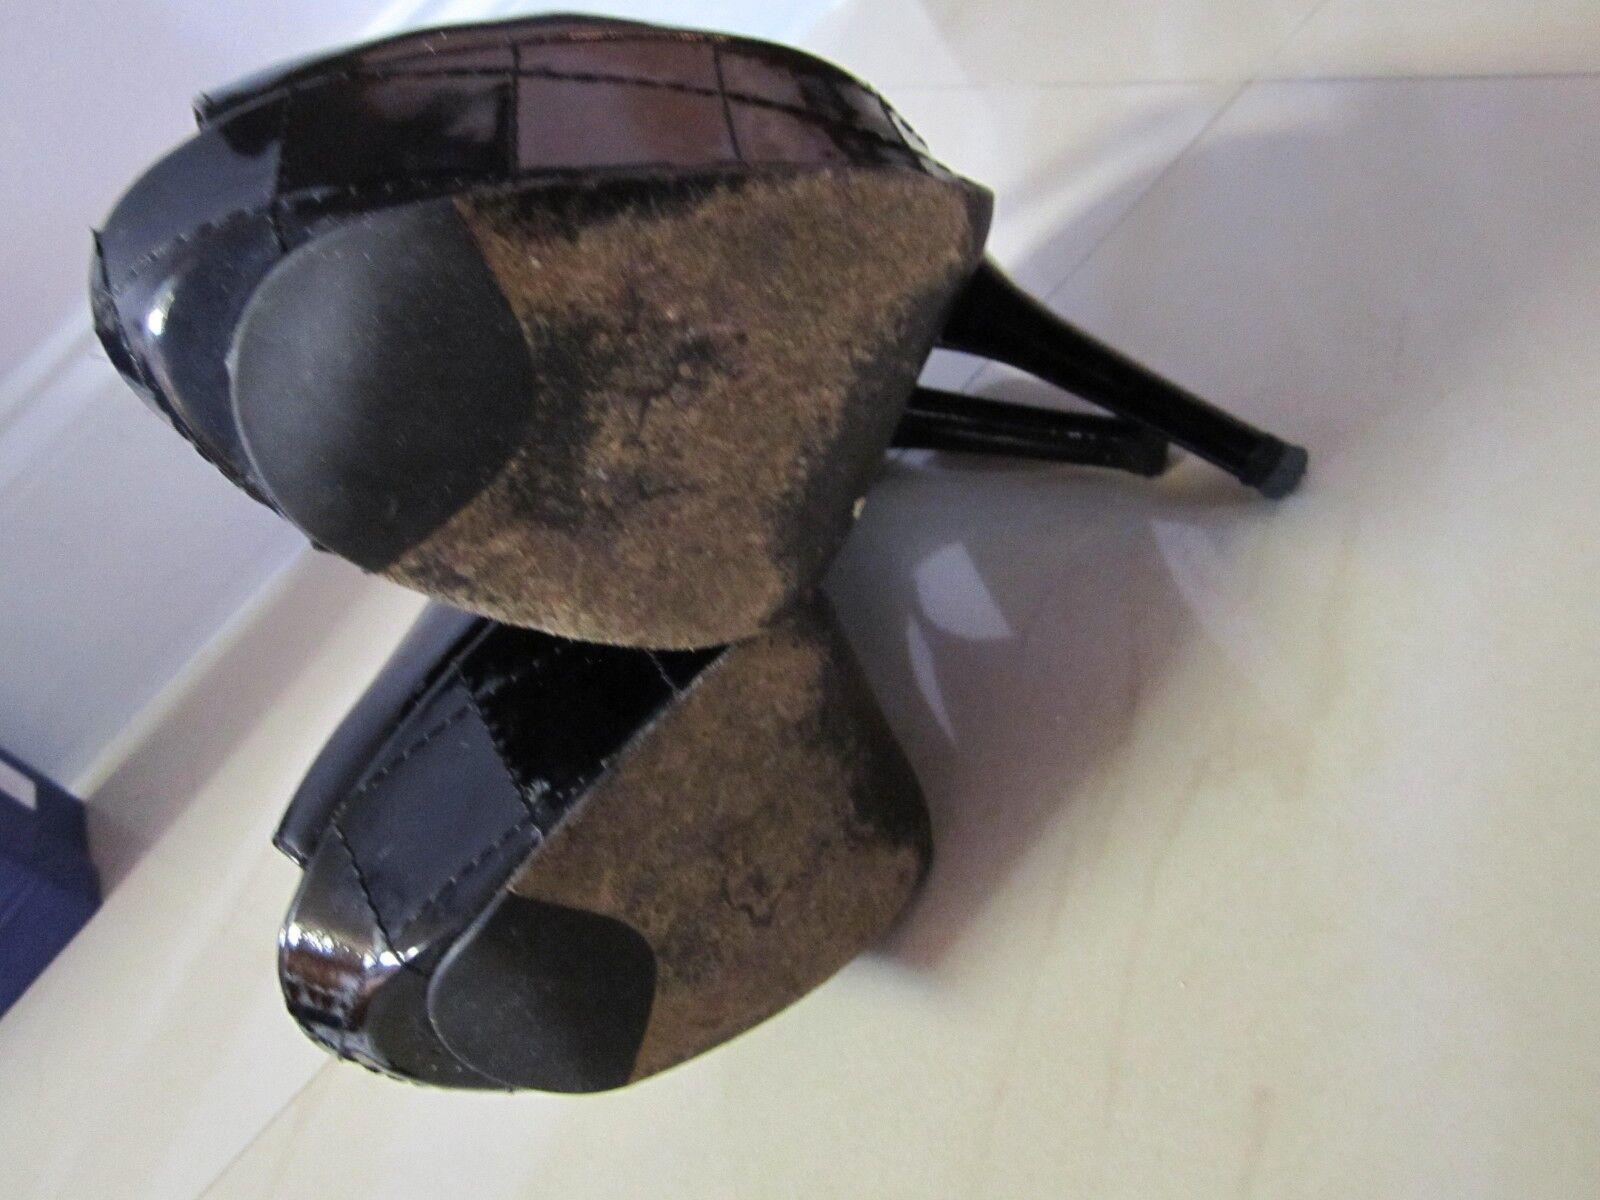 Stuart Weitzman CAPVEVEY Taupe damen Größe 8.5 8.5 8.5 High Heels Pump Peep Toe Größe 9M a09582